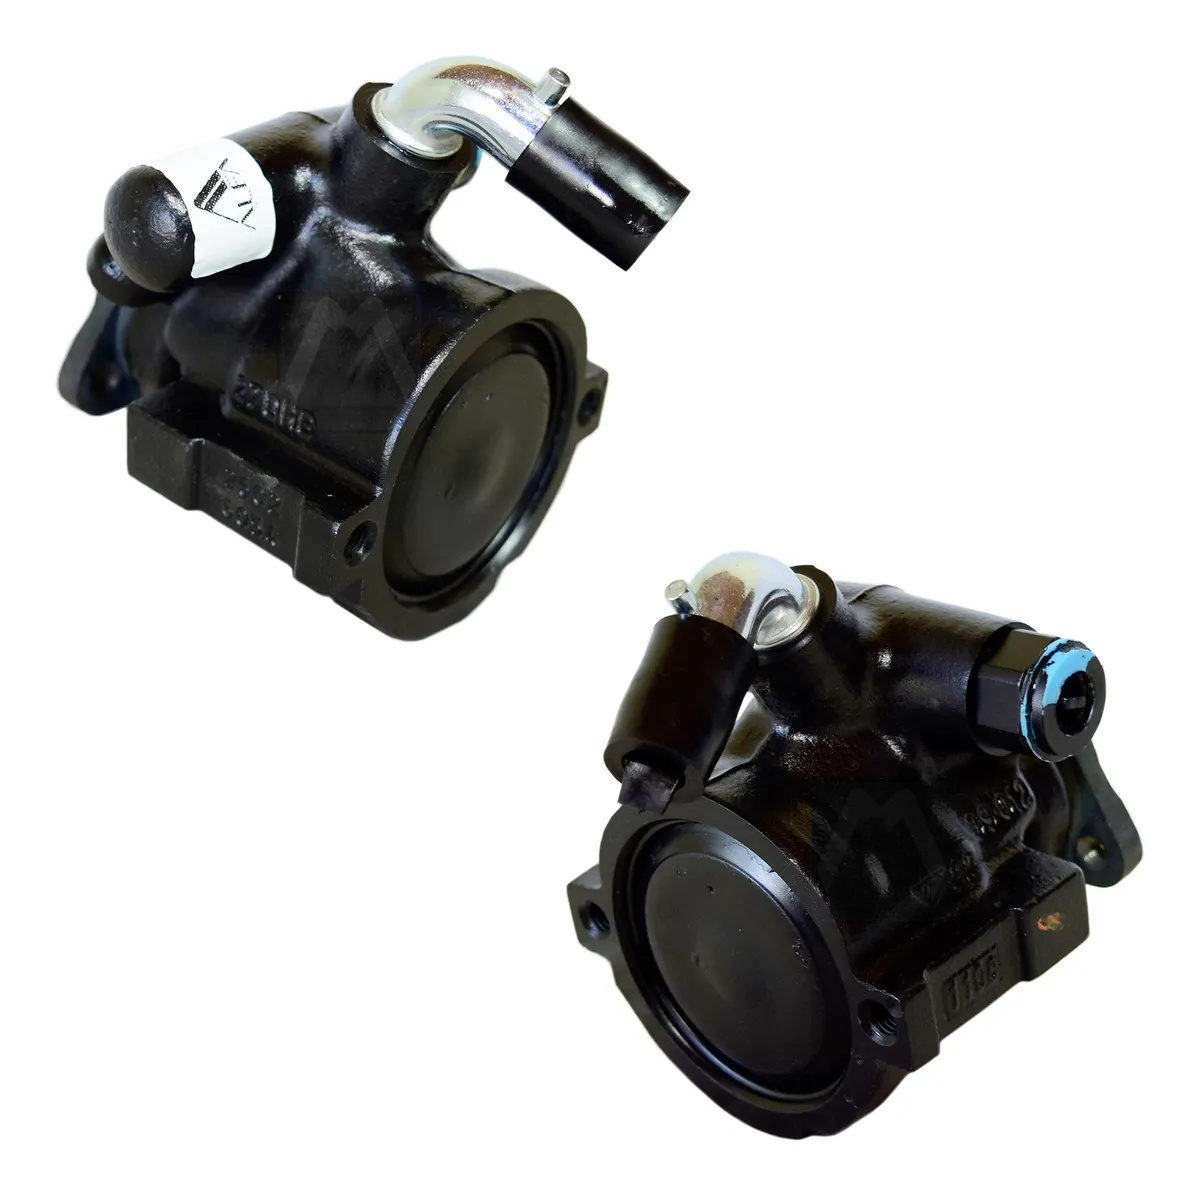 Bomba Direção Hidráulica DHB Gol, Parati, Saveiro 1.6, 1.8, 2.0 G2/G3/G4 (Motor AP)